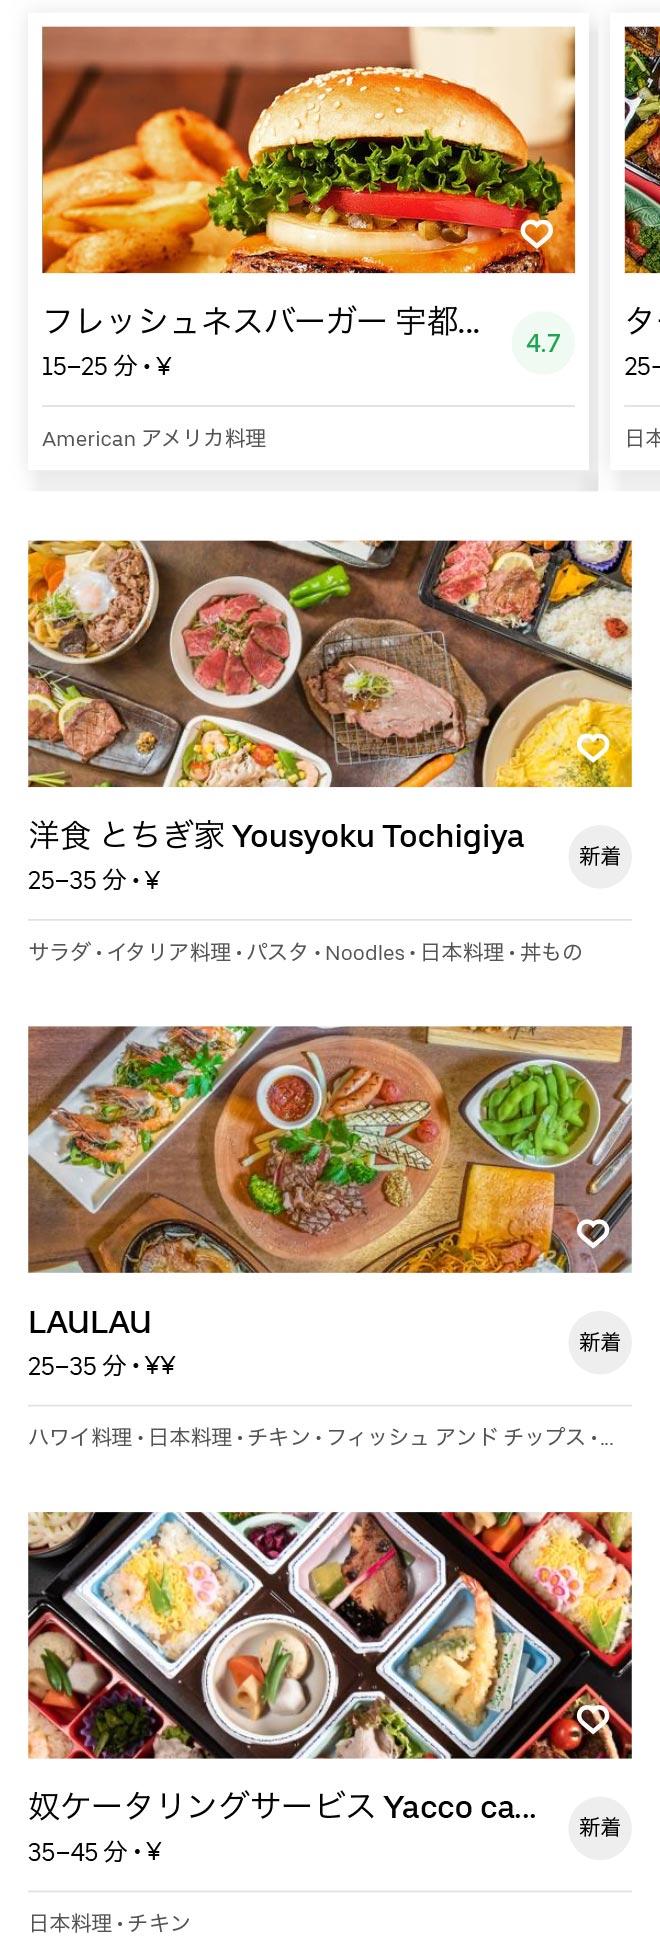 Utsunomiya menu 200602